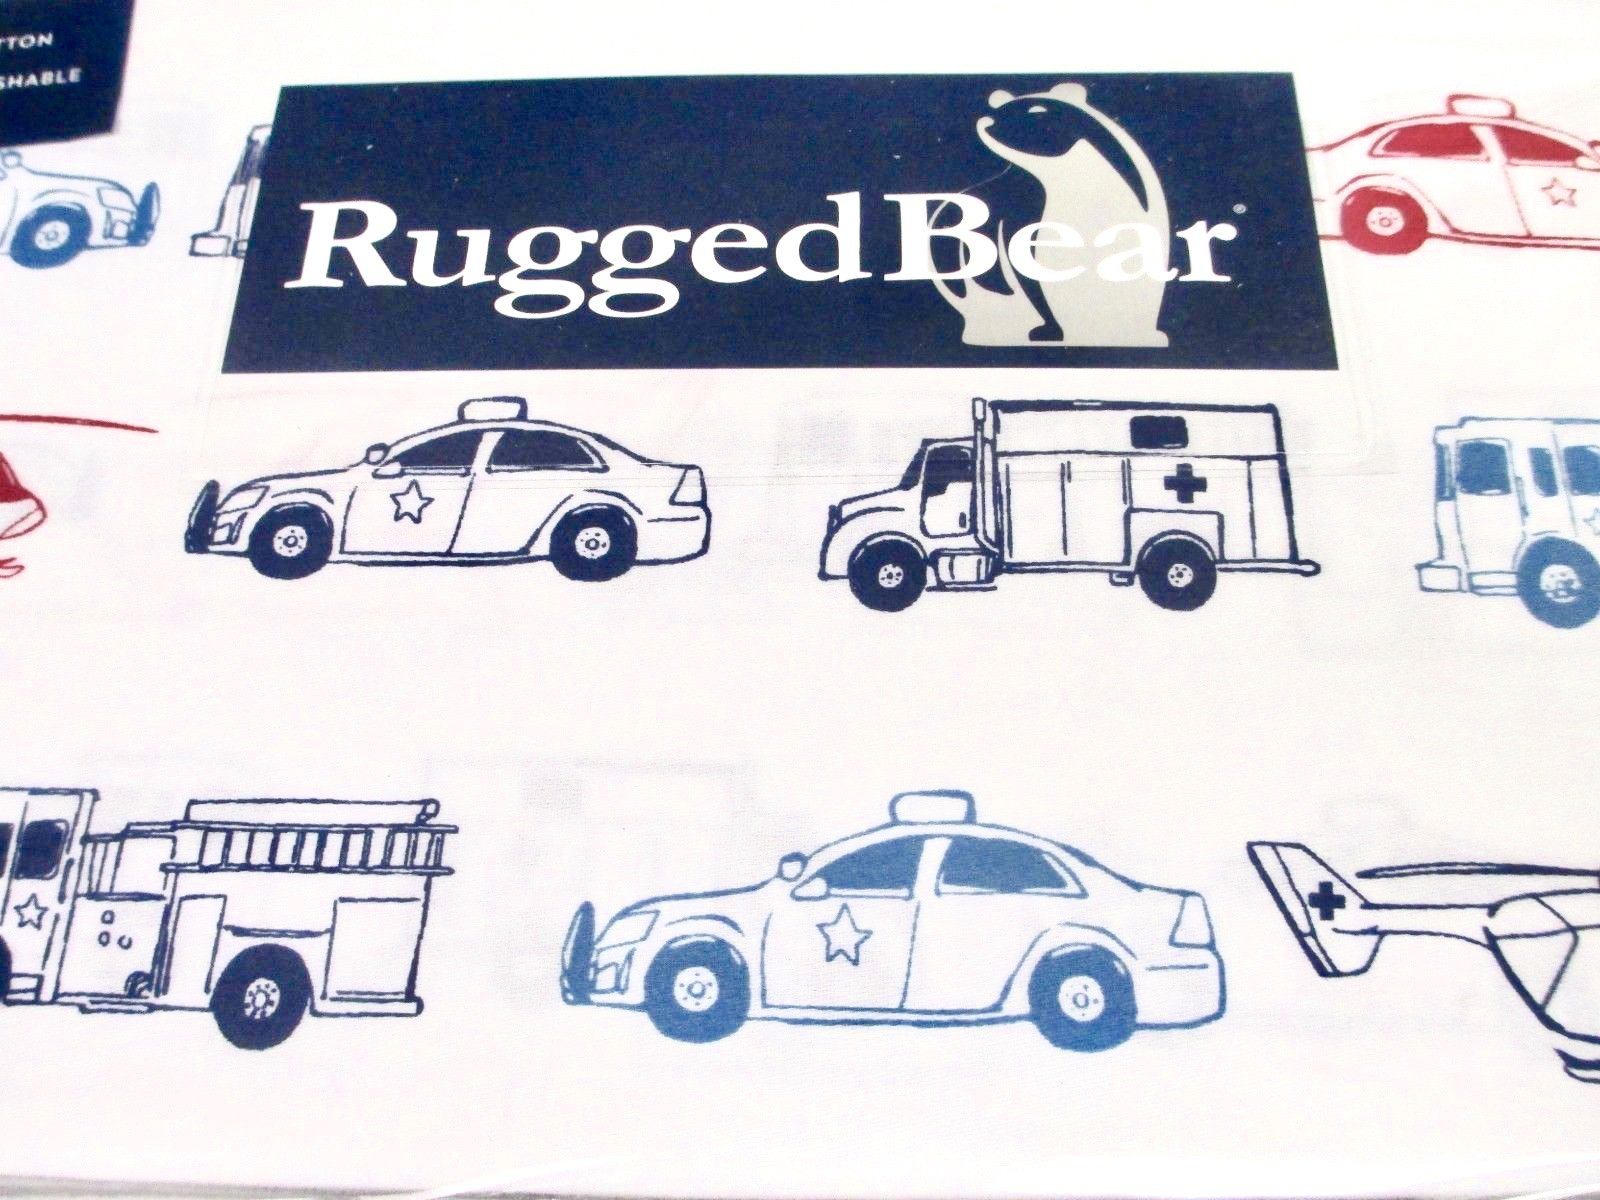 Rugged Bear Emergency Vehicle Sheet Set, Twin Size